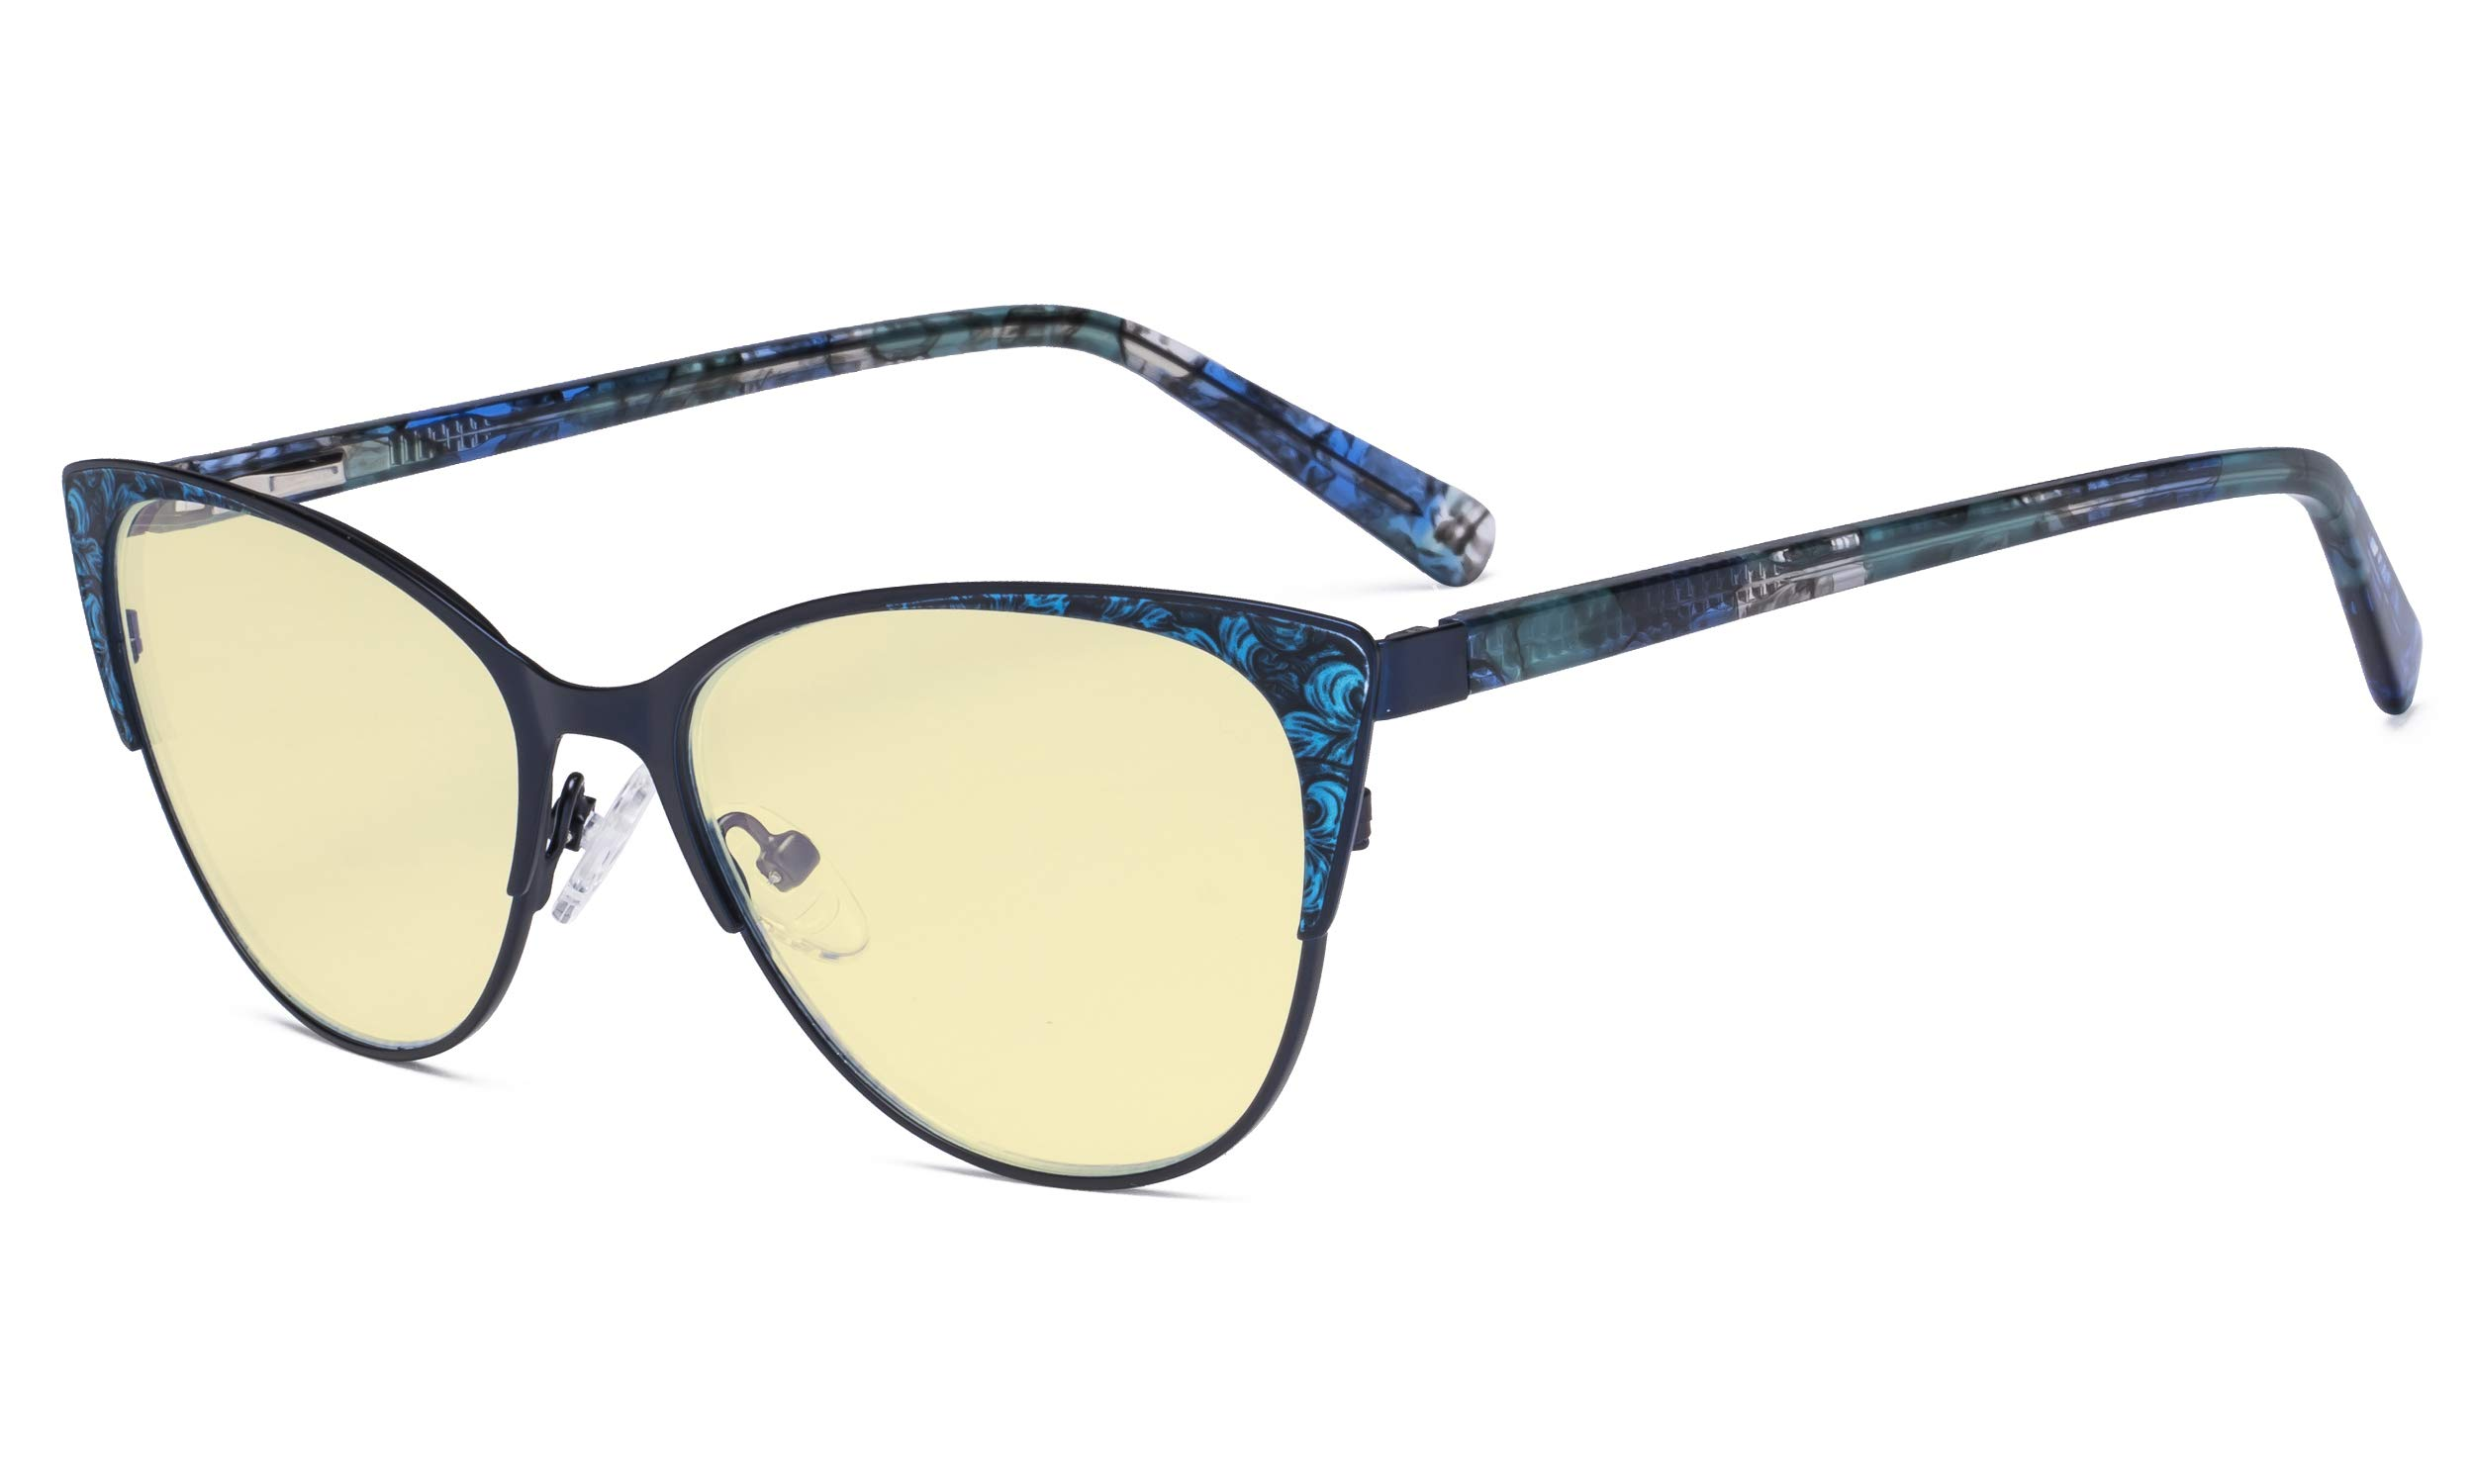 Eyekepper Oversize Ladies Butterfly Design Blue Light Blocking Glasses - Anti Glare UV Rays Computer Screen Eyegalsses Women - Cut Digital Glare Yellow Filter Lens Reduce Eye Strain - Blue